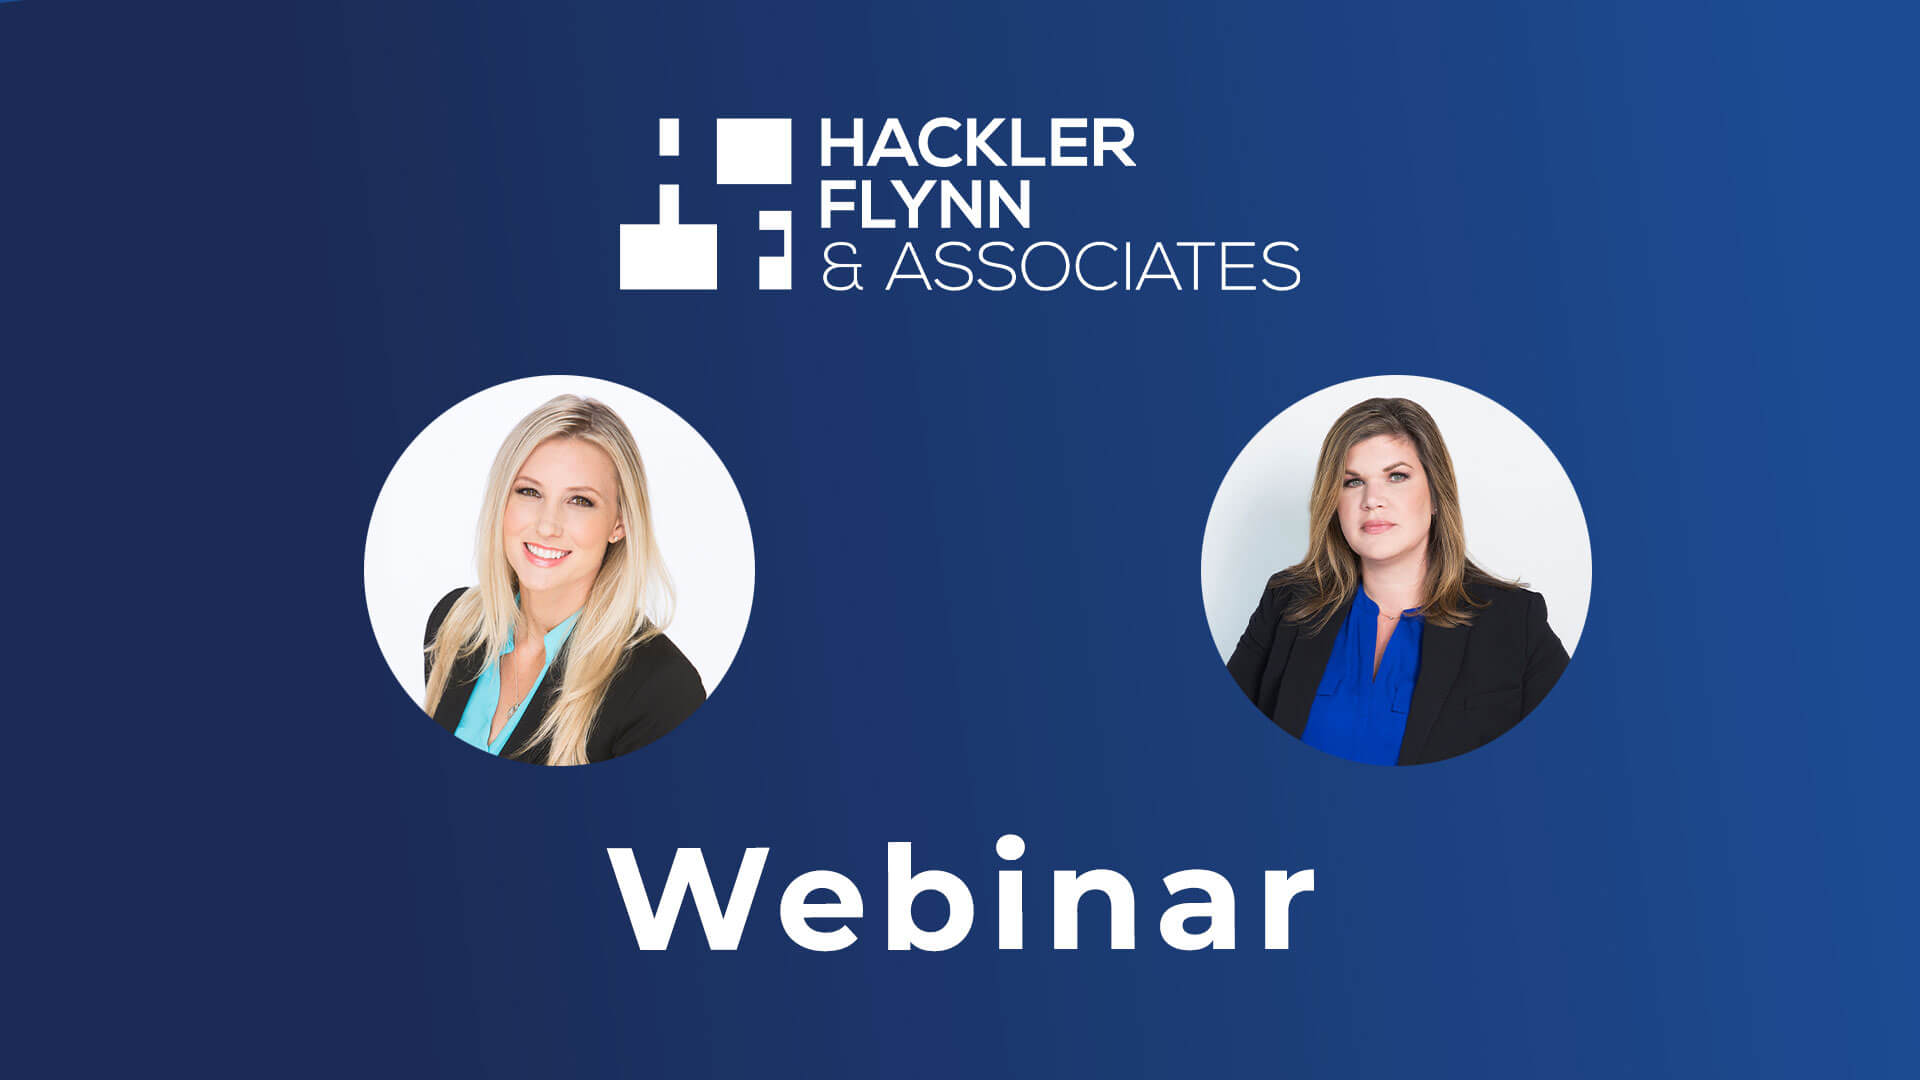 Hackler Flynn & Associates Webinar Cindy Michelle